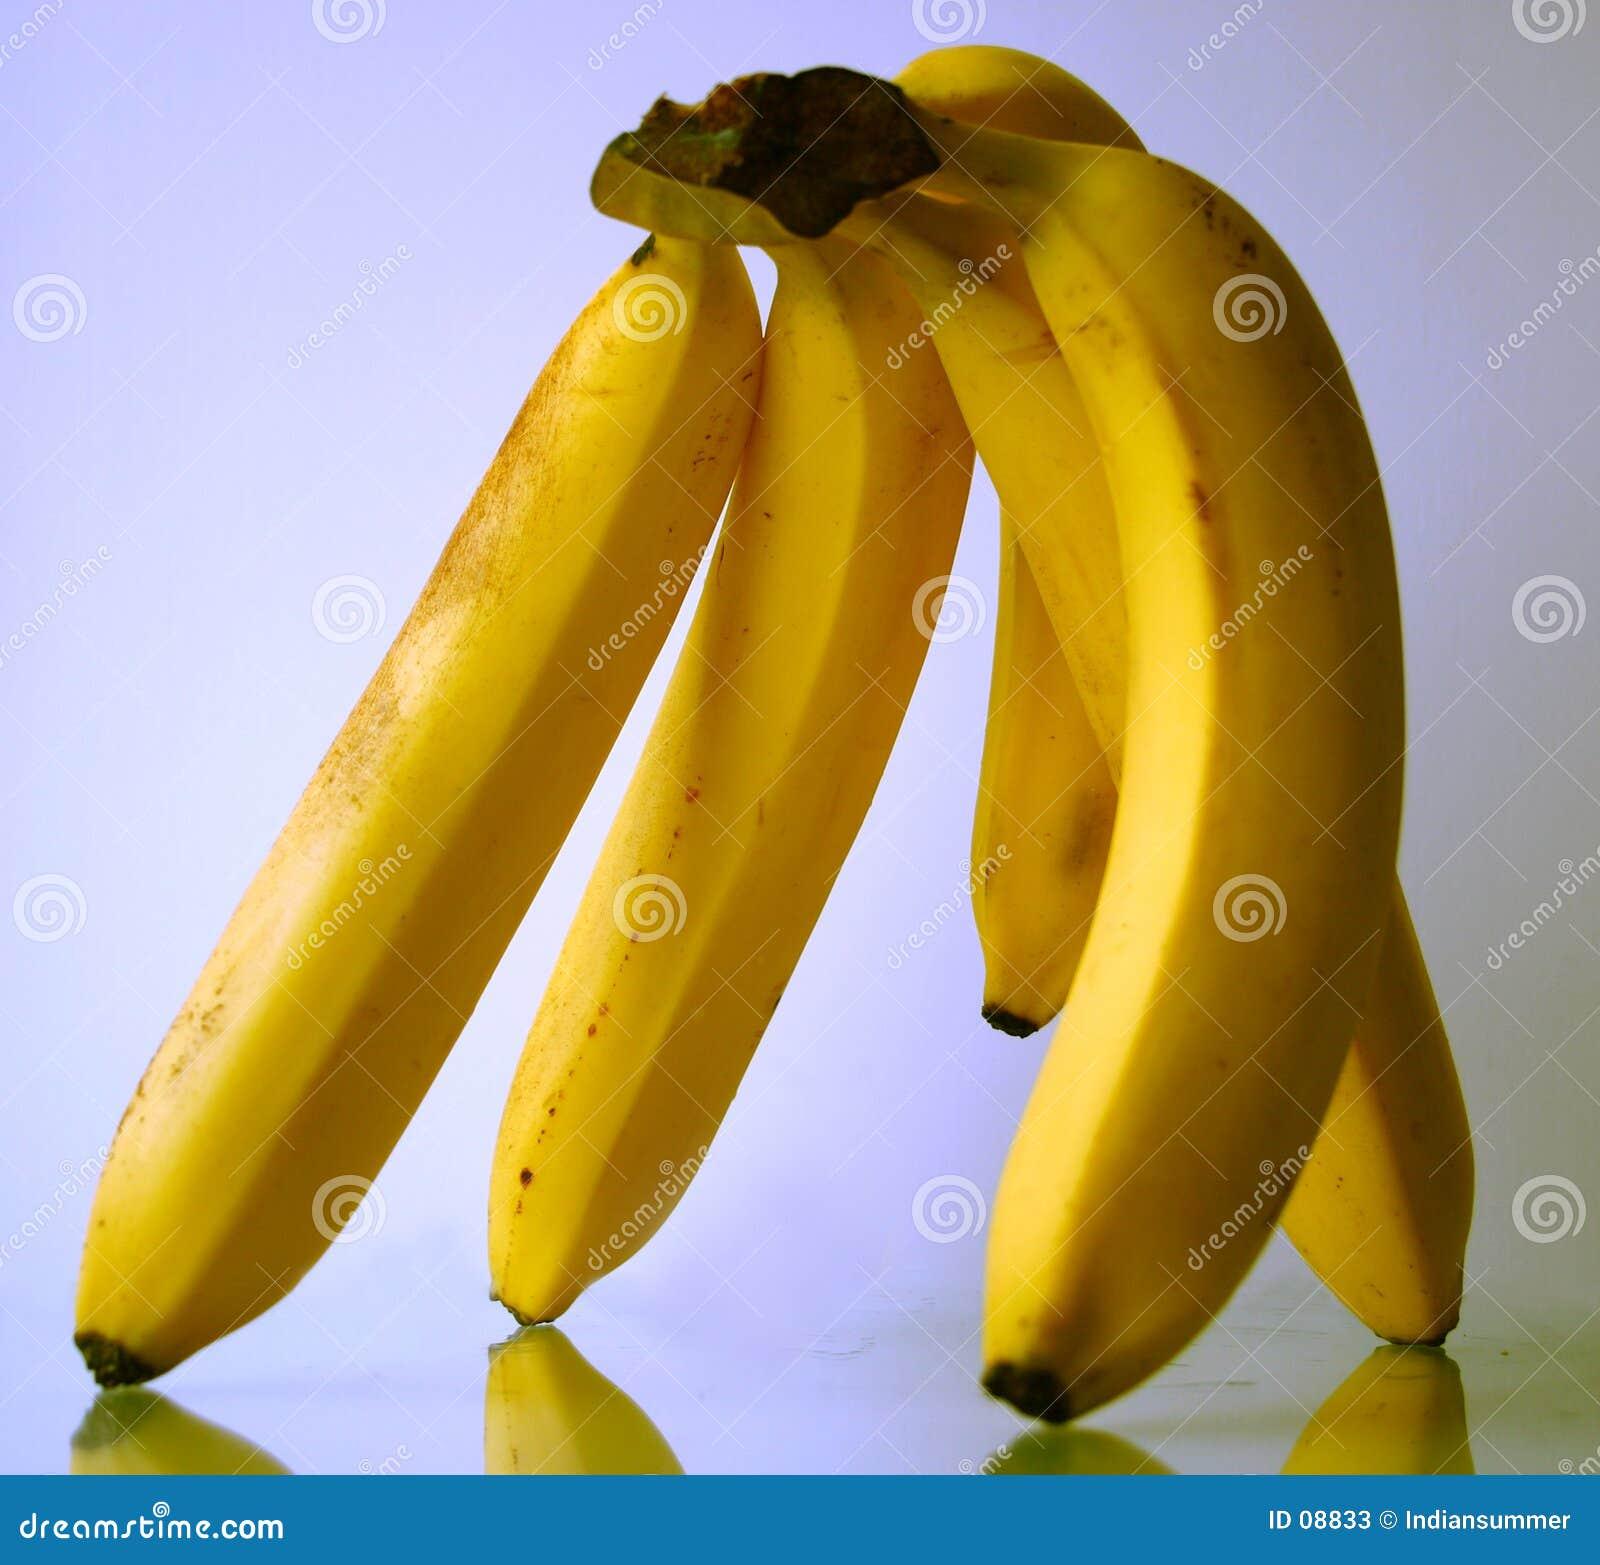 Mano delle banane